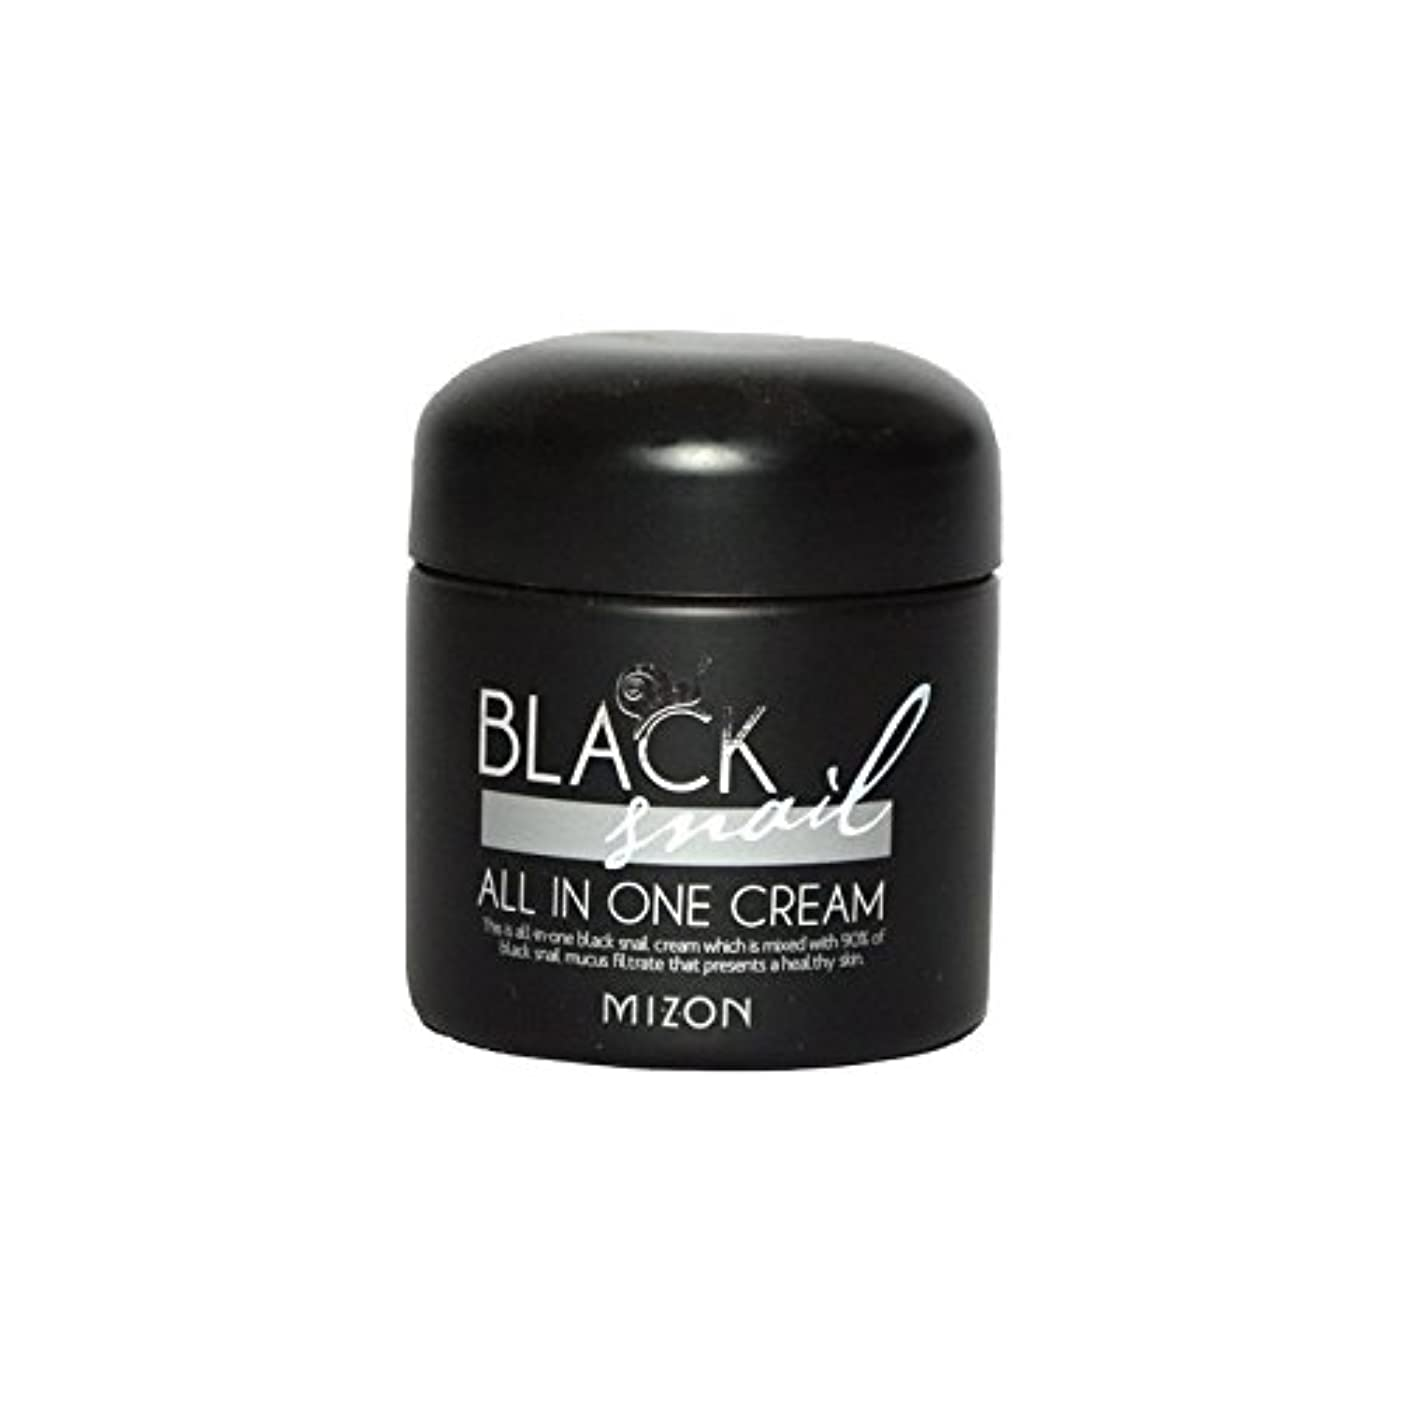 Mizon Black Snail All in One Cream - 黒カタツムリオールインワンクリーム [並行輸入品]